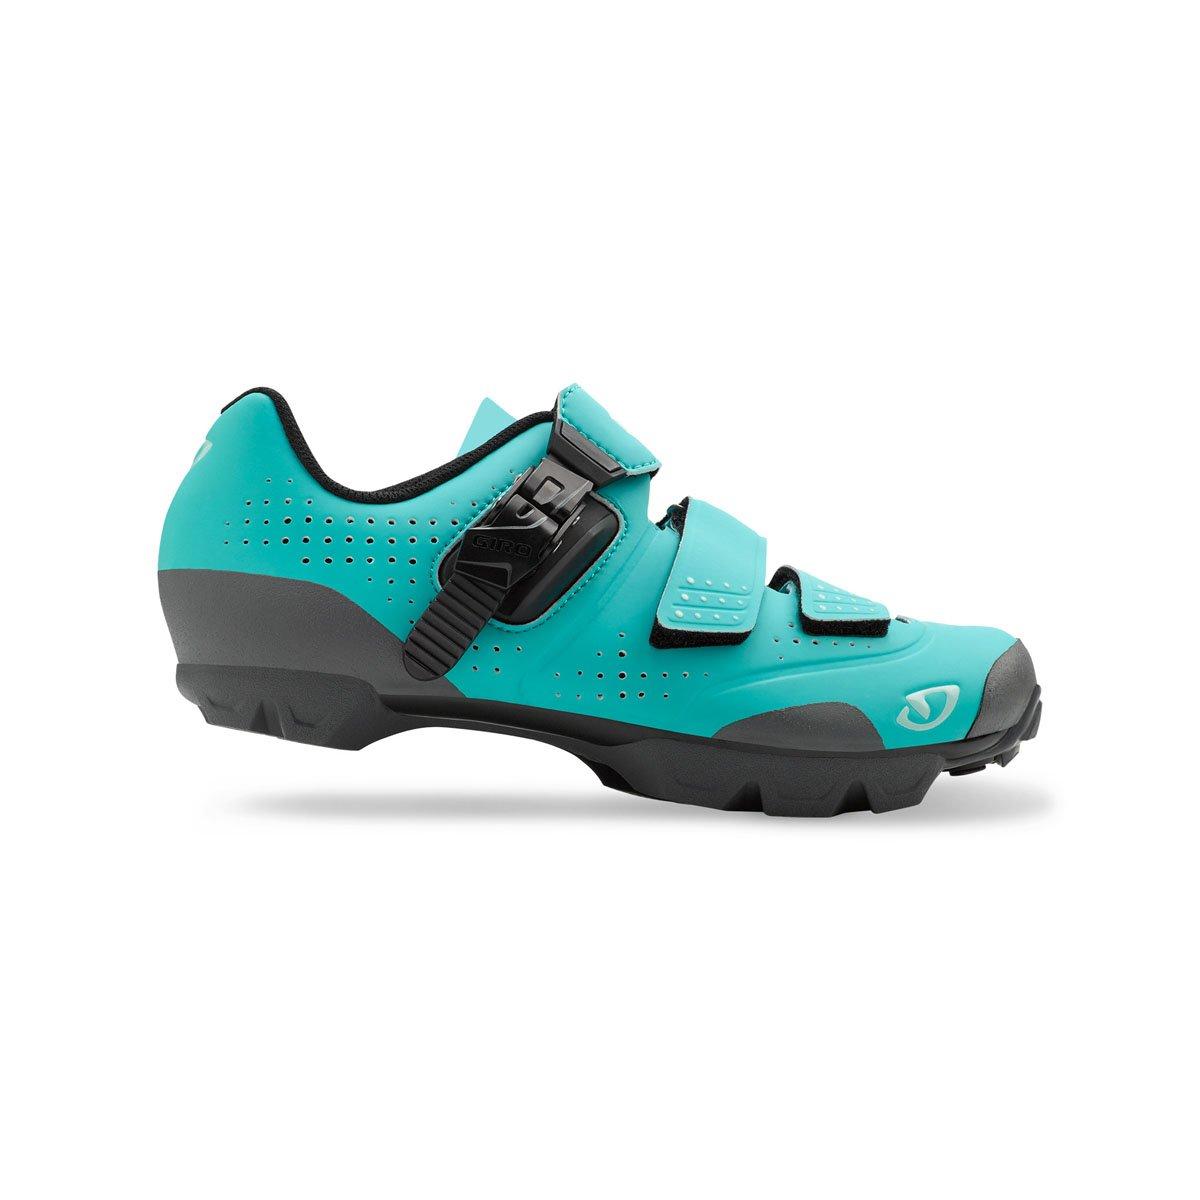 Giro Manta R Shoes - Women's B076B17HT2 38|Glacier/Titanium